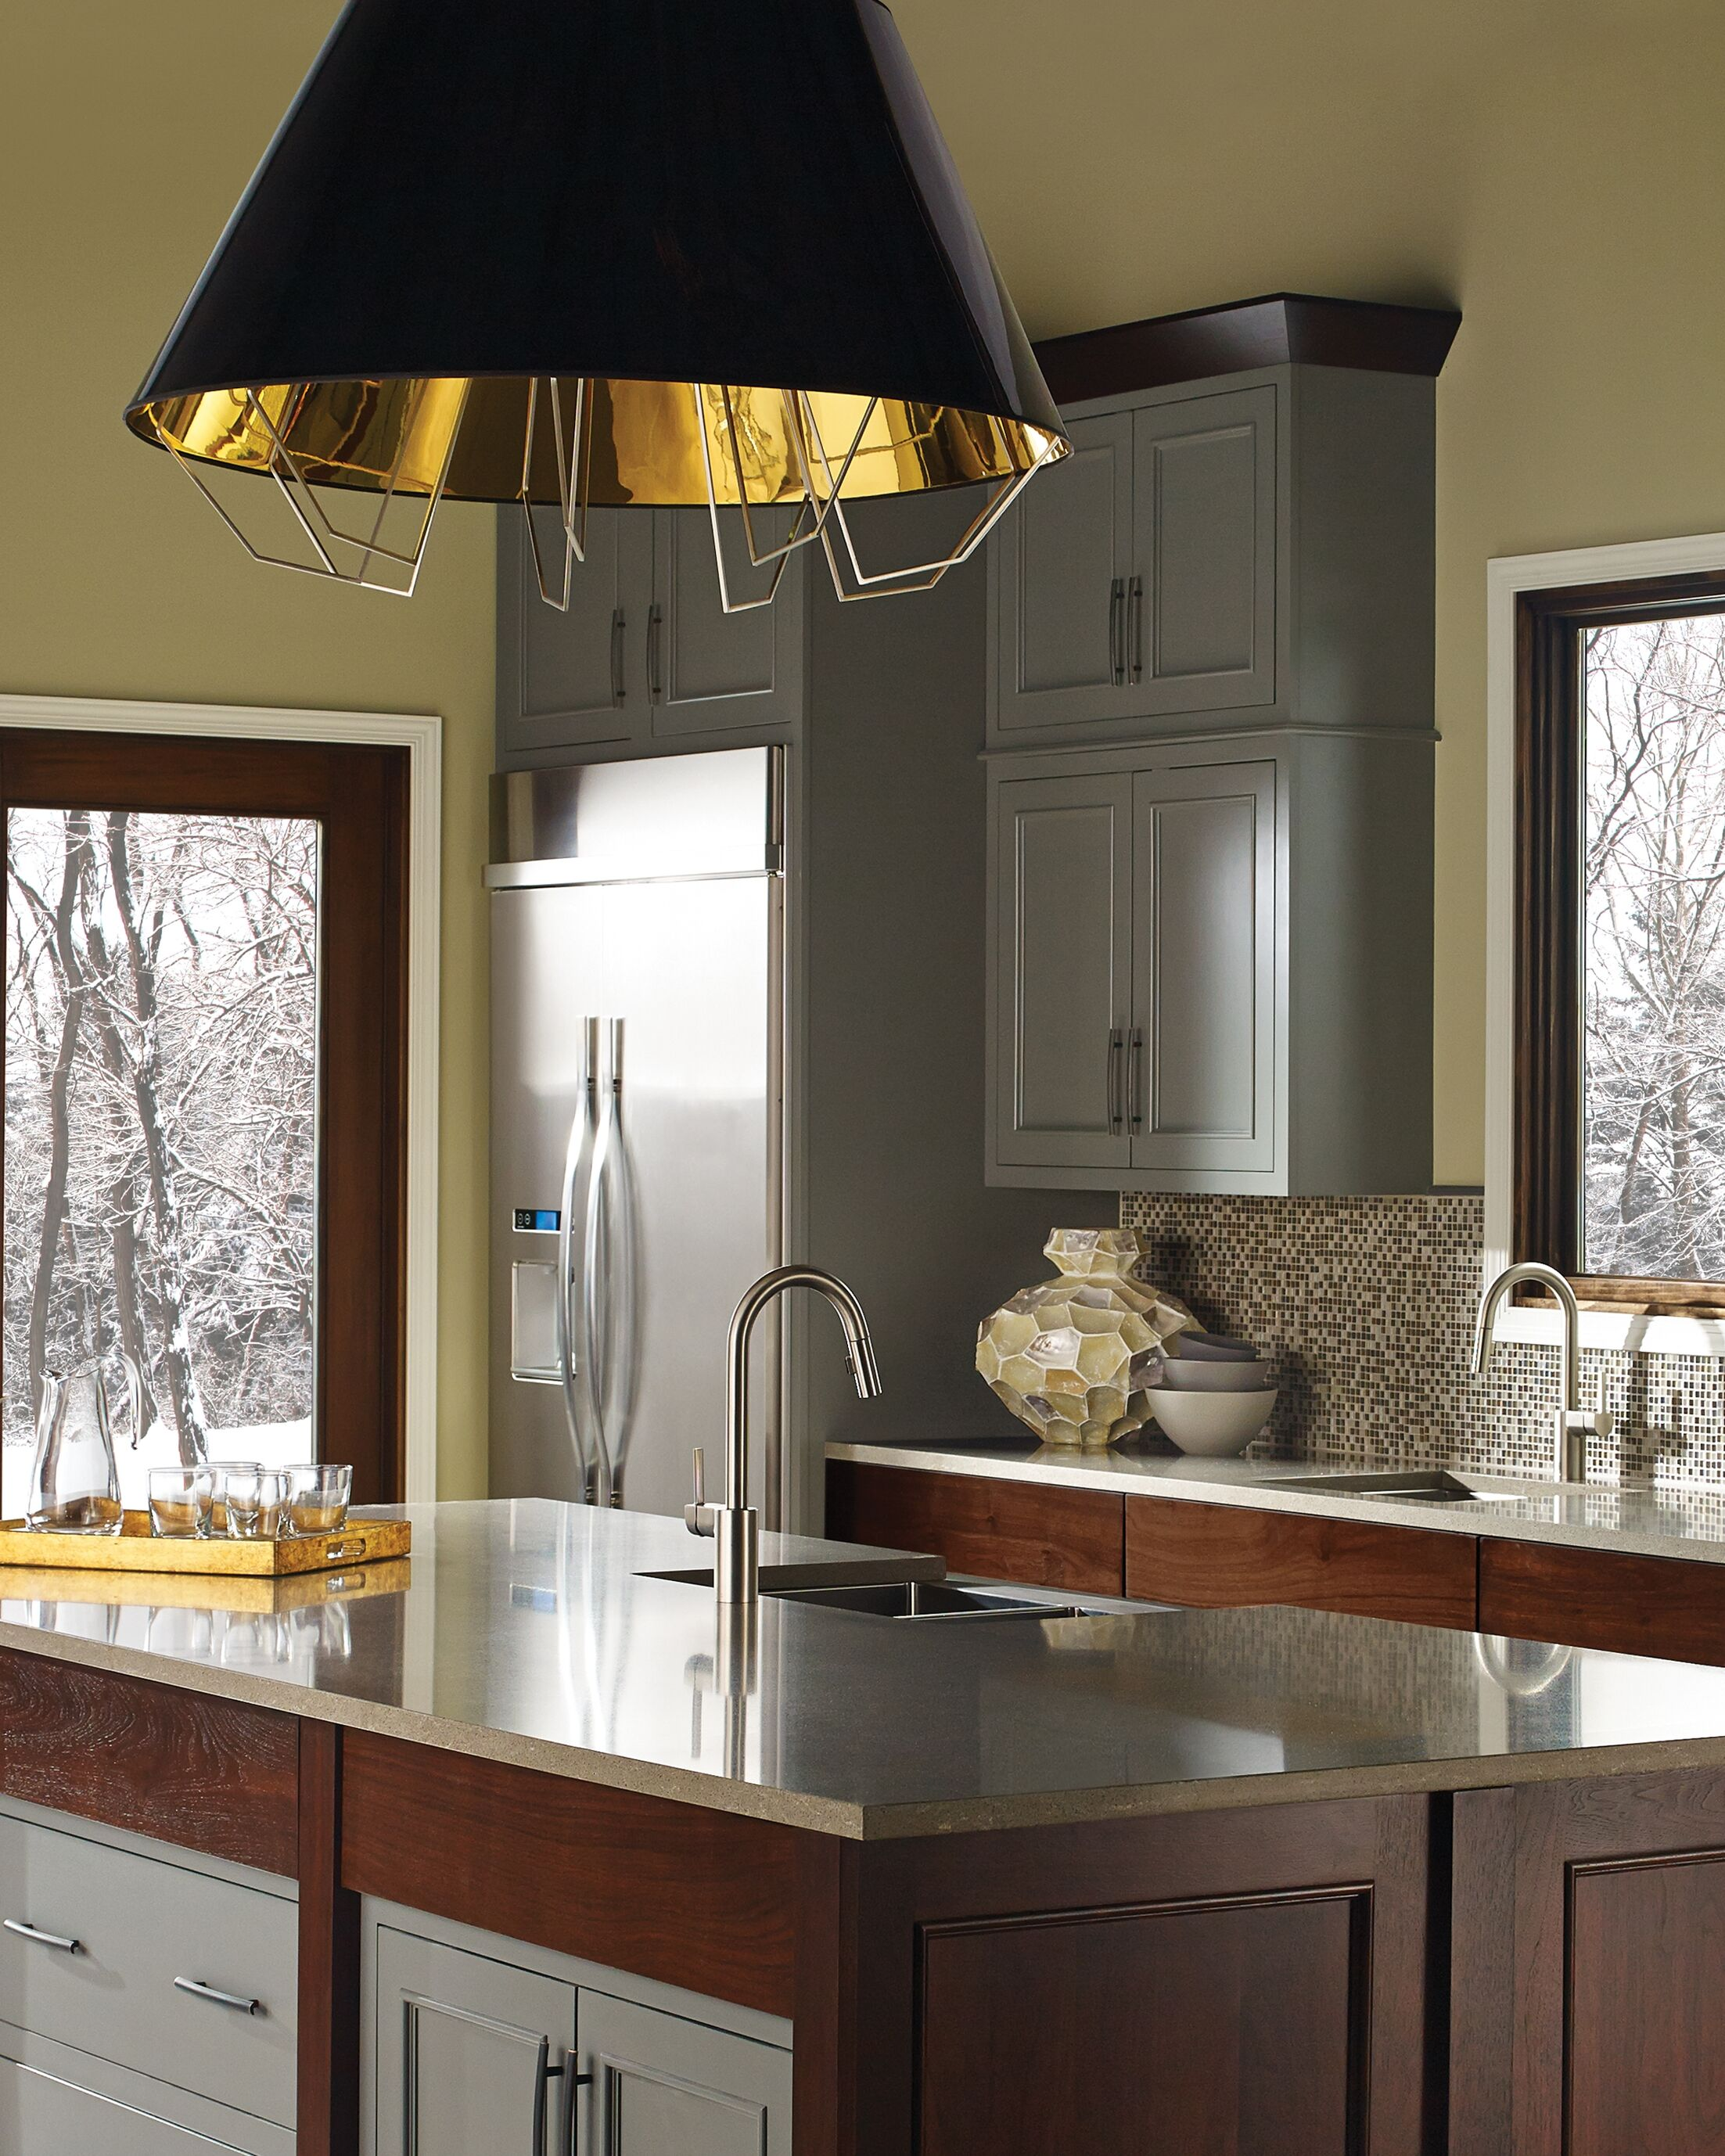 Davila 3-Light Inverted Pendant Shade Color: Black Gold, Bulb Type: Incandescent